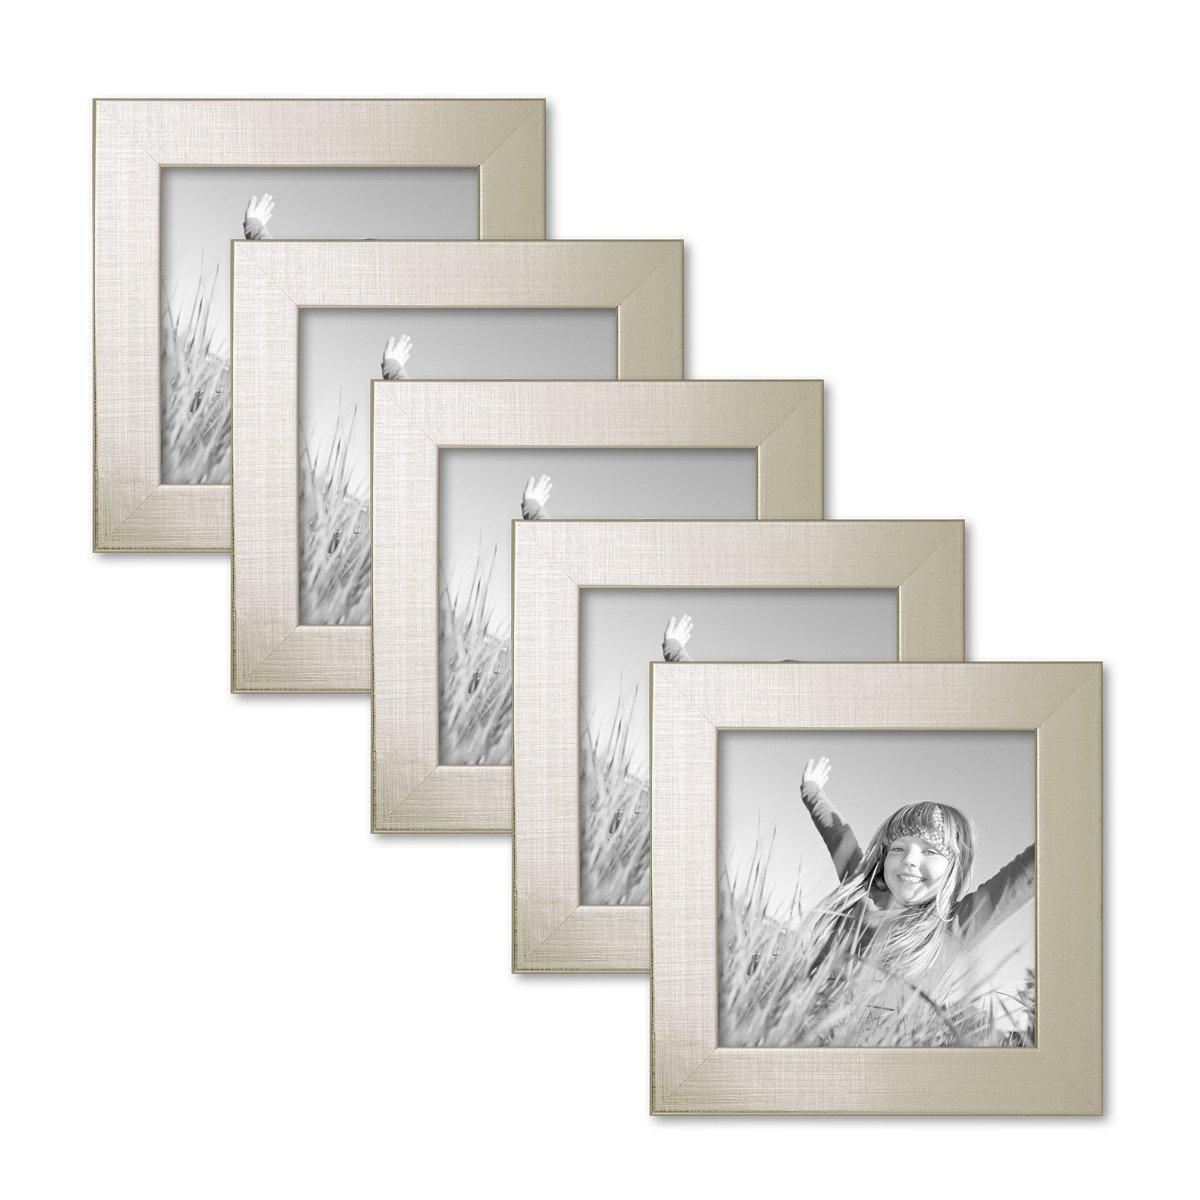 PHOTOLINI 5er Set Bilderrahmen 10x10 cm Gold Modern Massivholz-Rahmen mit Glasscheibe inkl. Zubehör/Fotorahmen